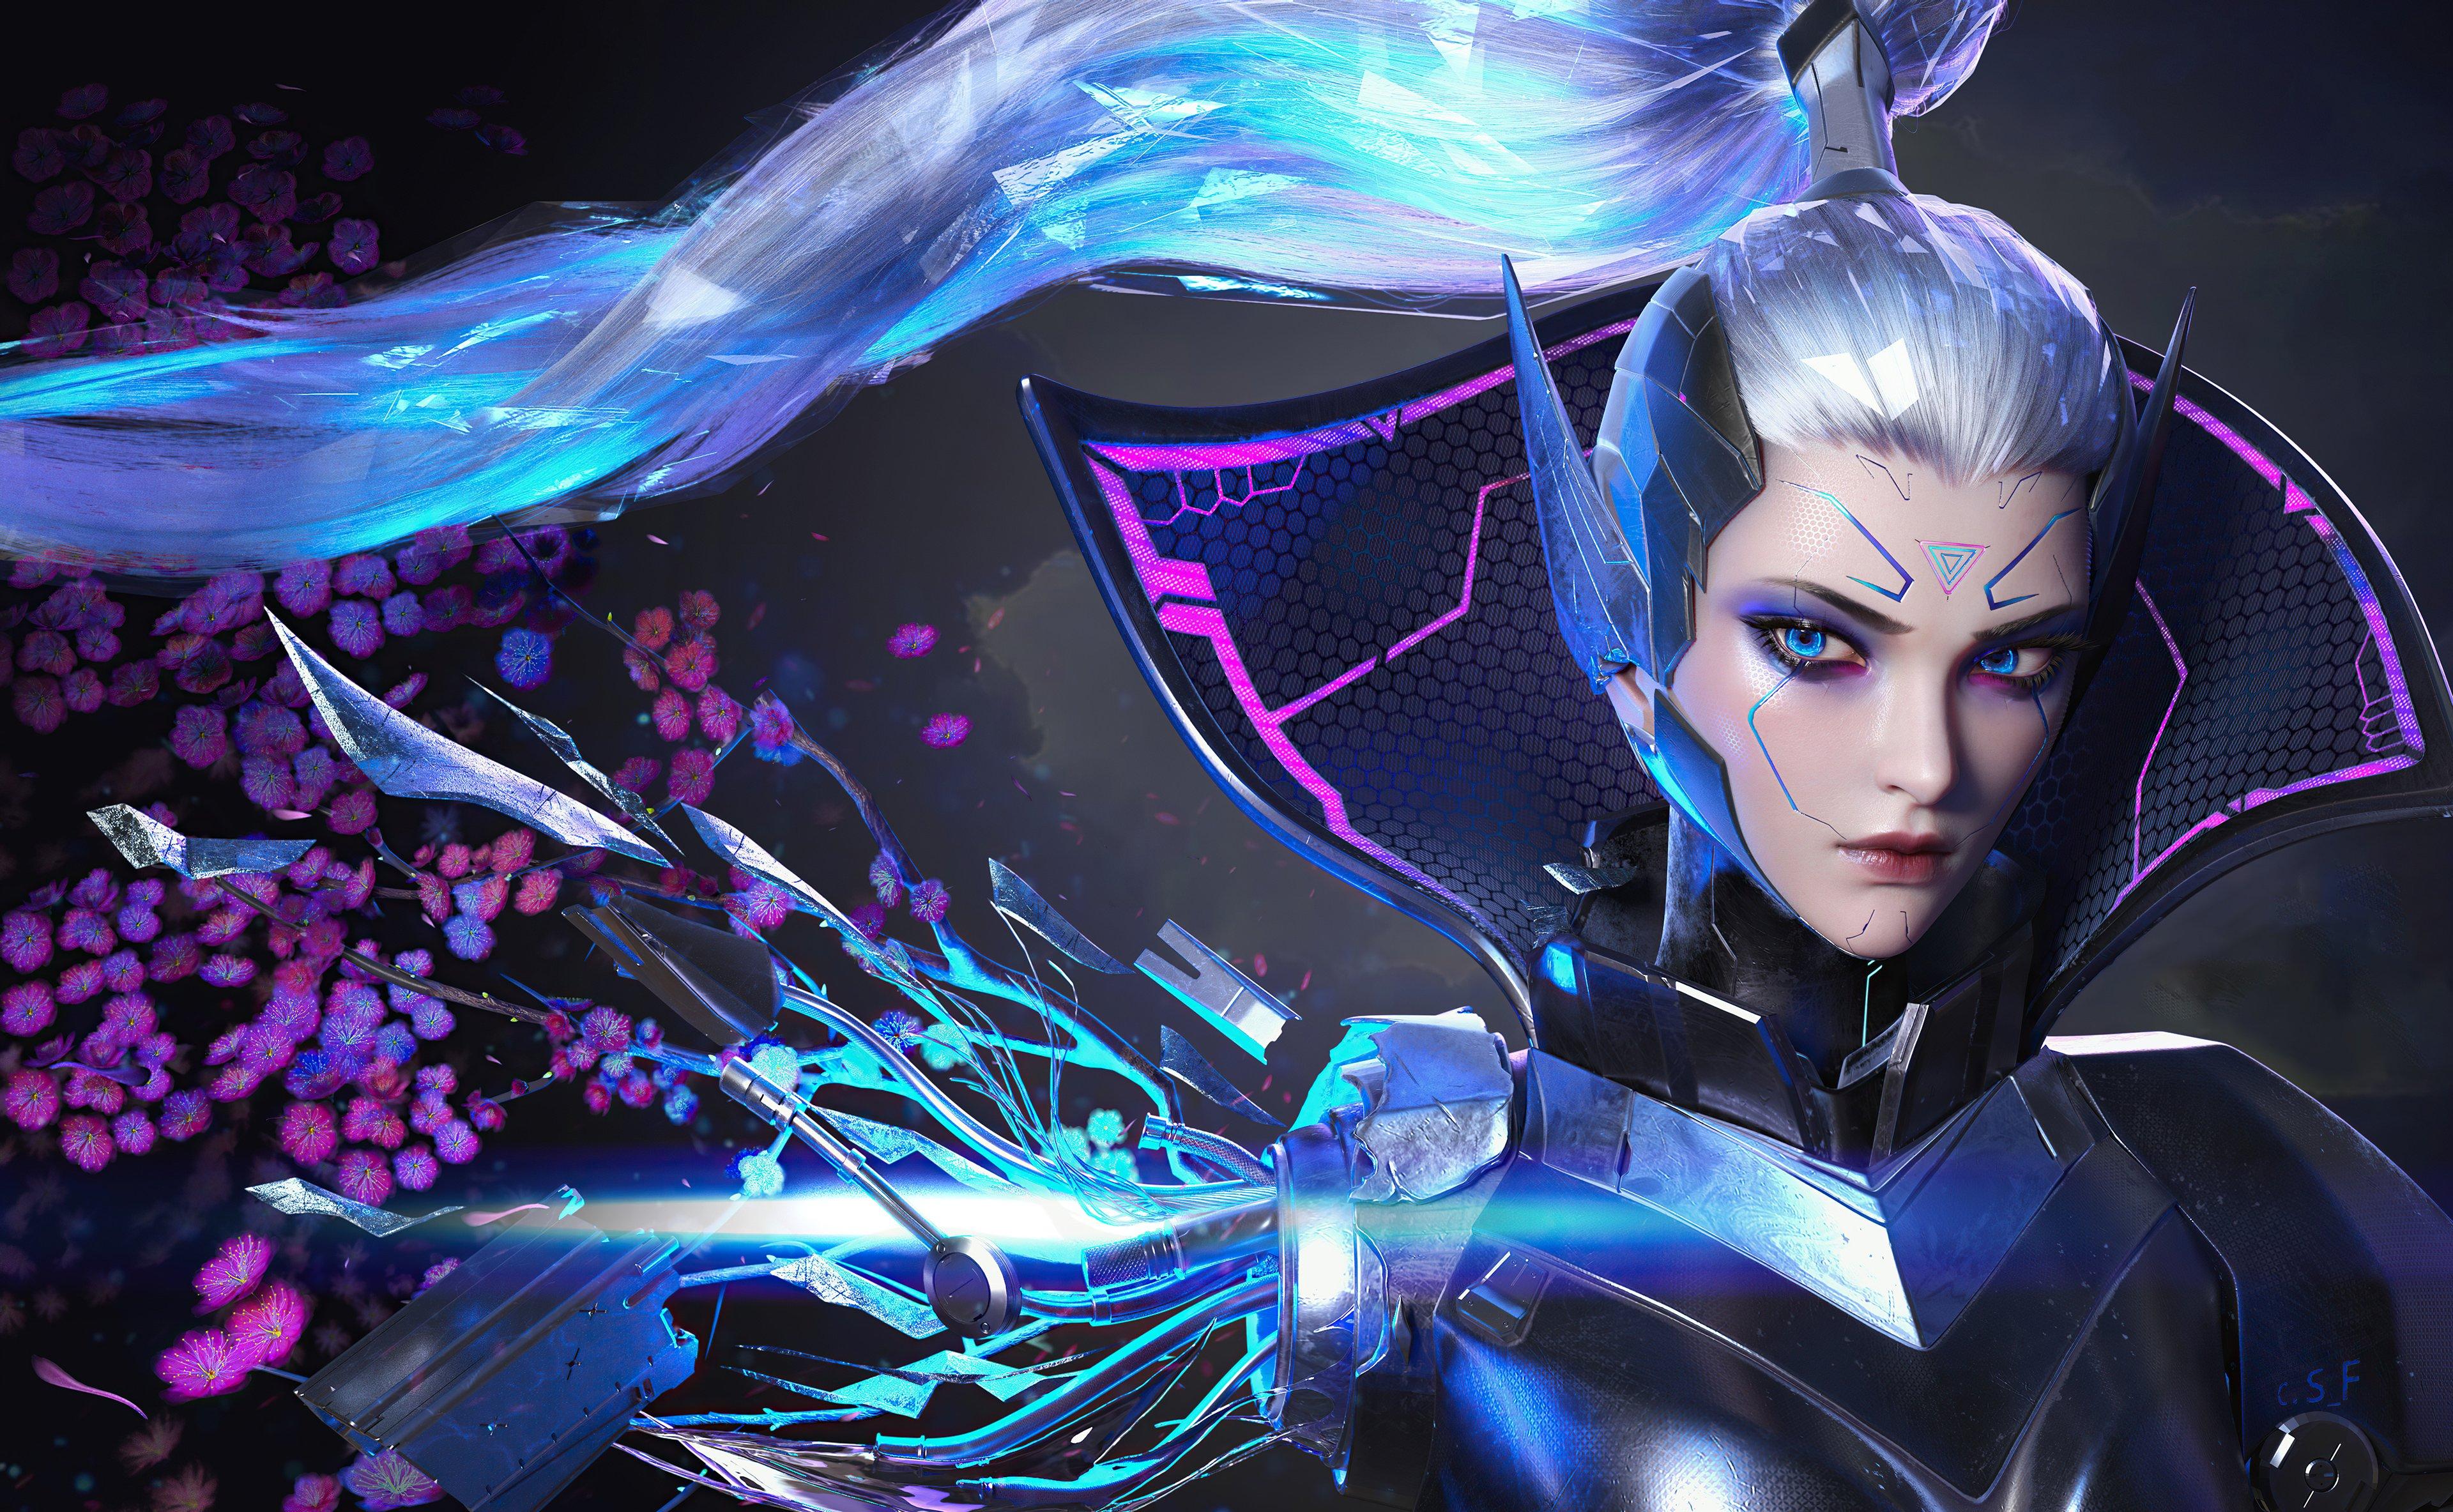 Fondos de pantalla Retrato de Vayne League of Legends